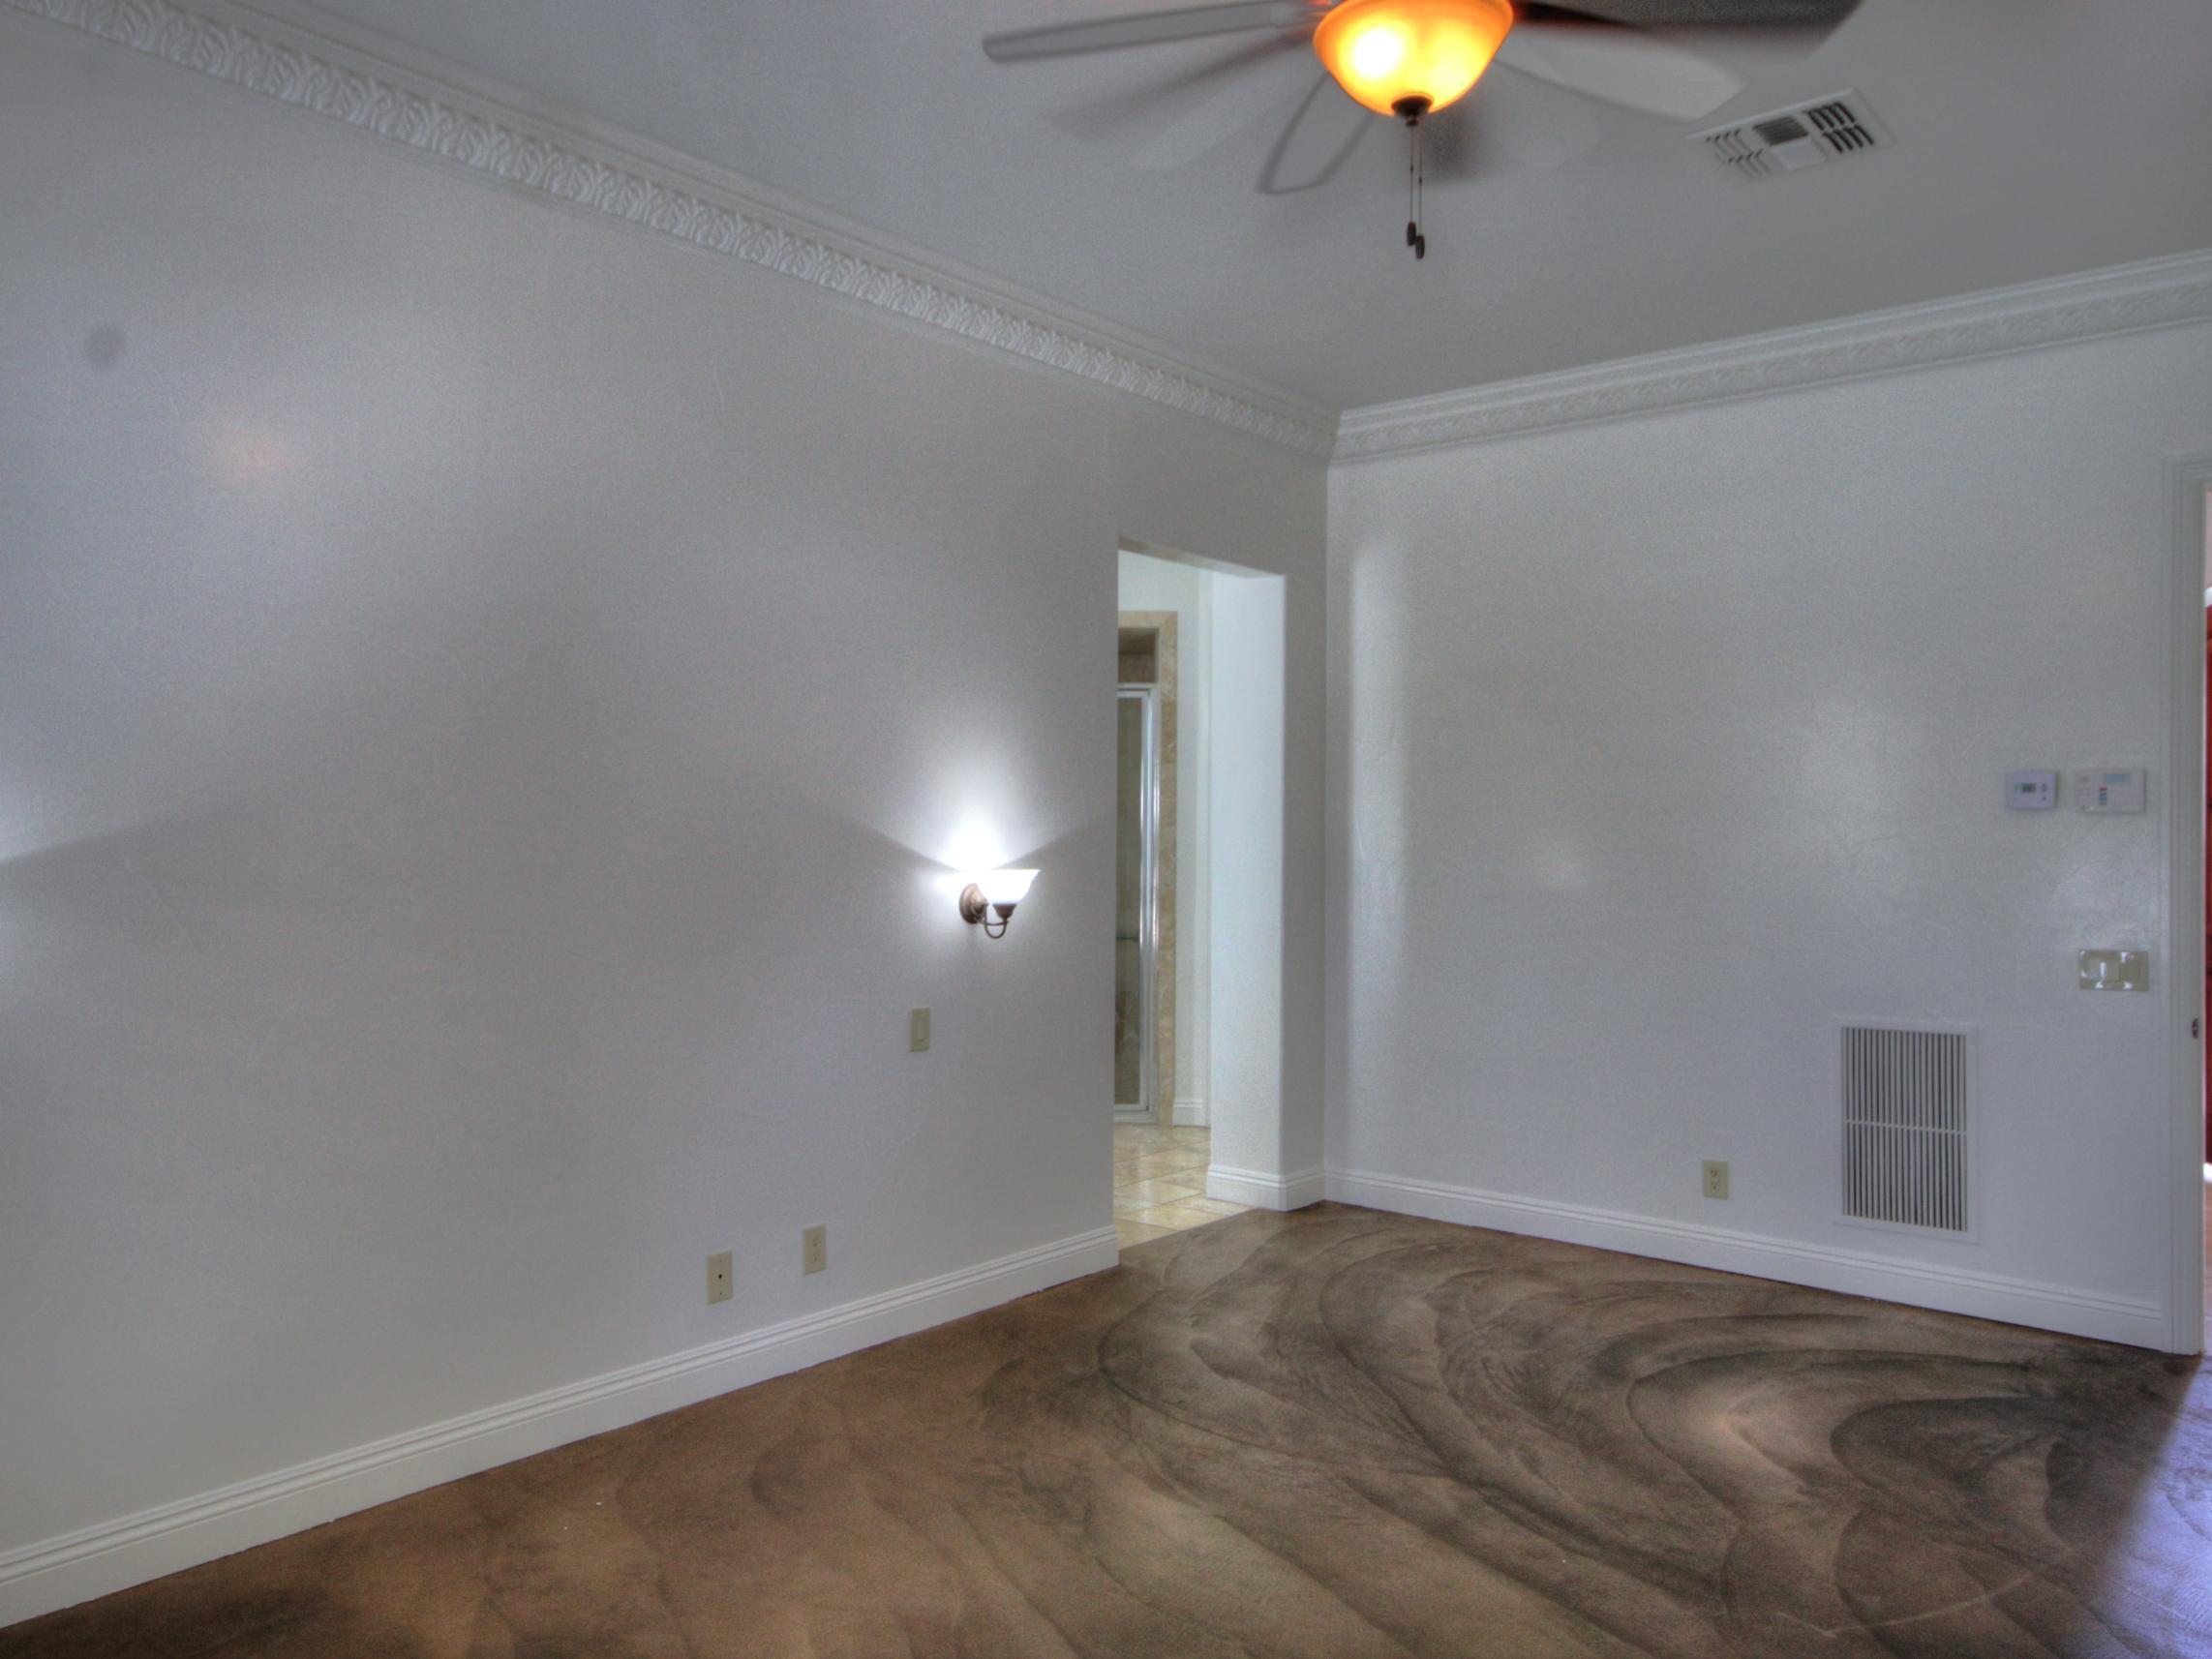 232 W Overlook Road, Palm Springs, California 92264, 4 Bedrooms Bedrooms, ,4 BathroomsBathrooms,Residential,For Sale,232 W Overlook Road,219041494